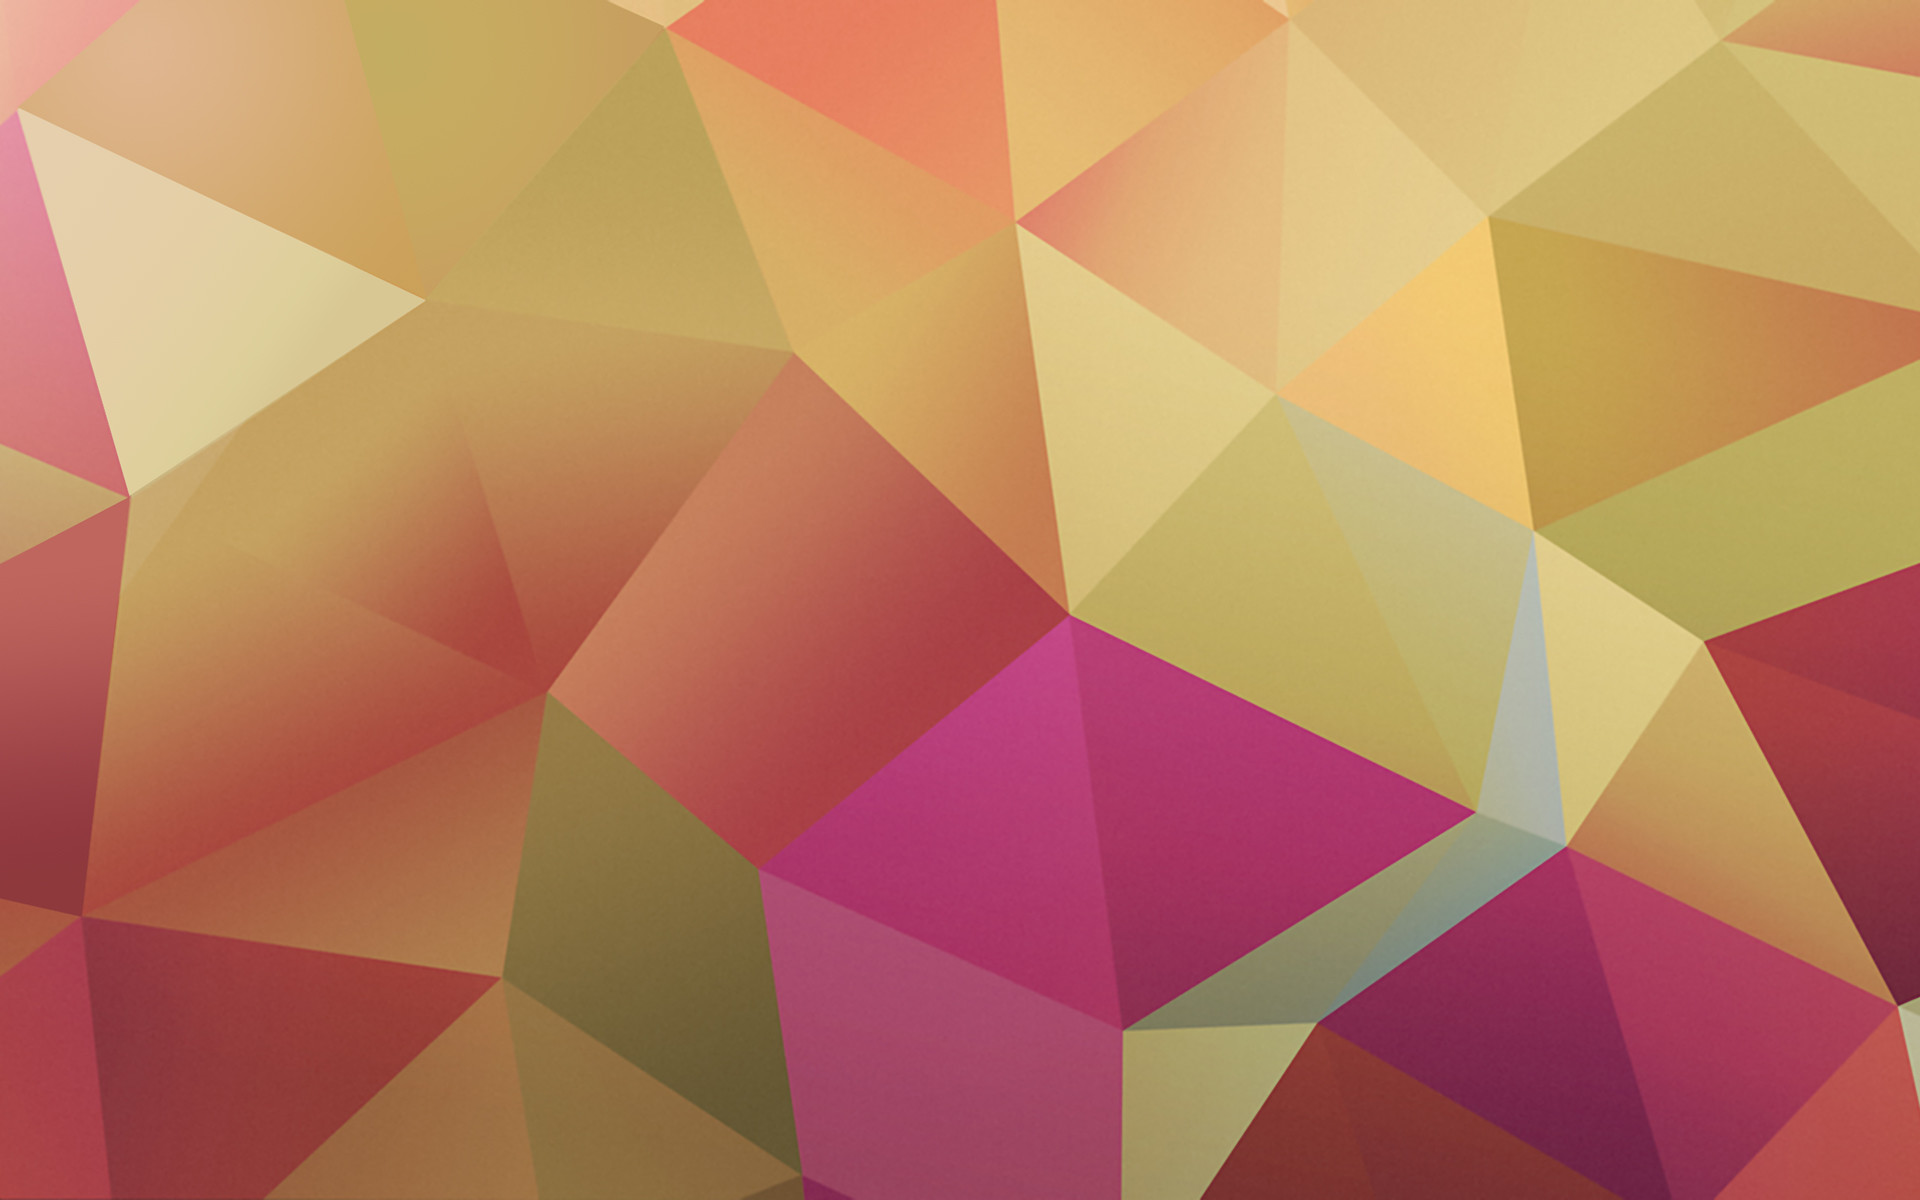 https://allsizewallpapers.files.wordpress.com/2012/08/jelly-bean-android-nexus-7-1920×1200.jpg